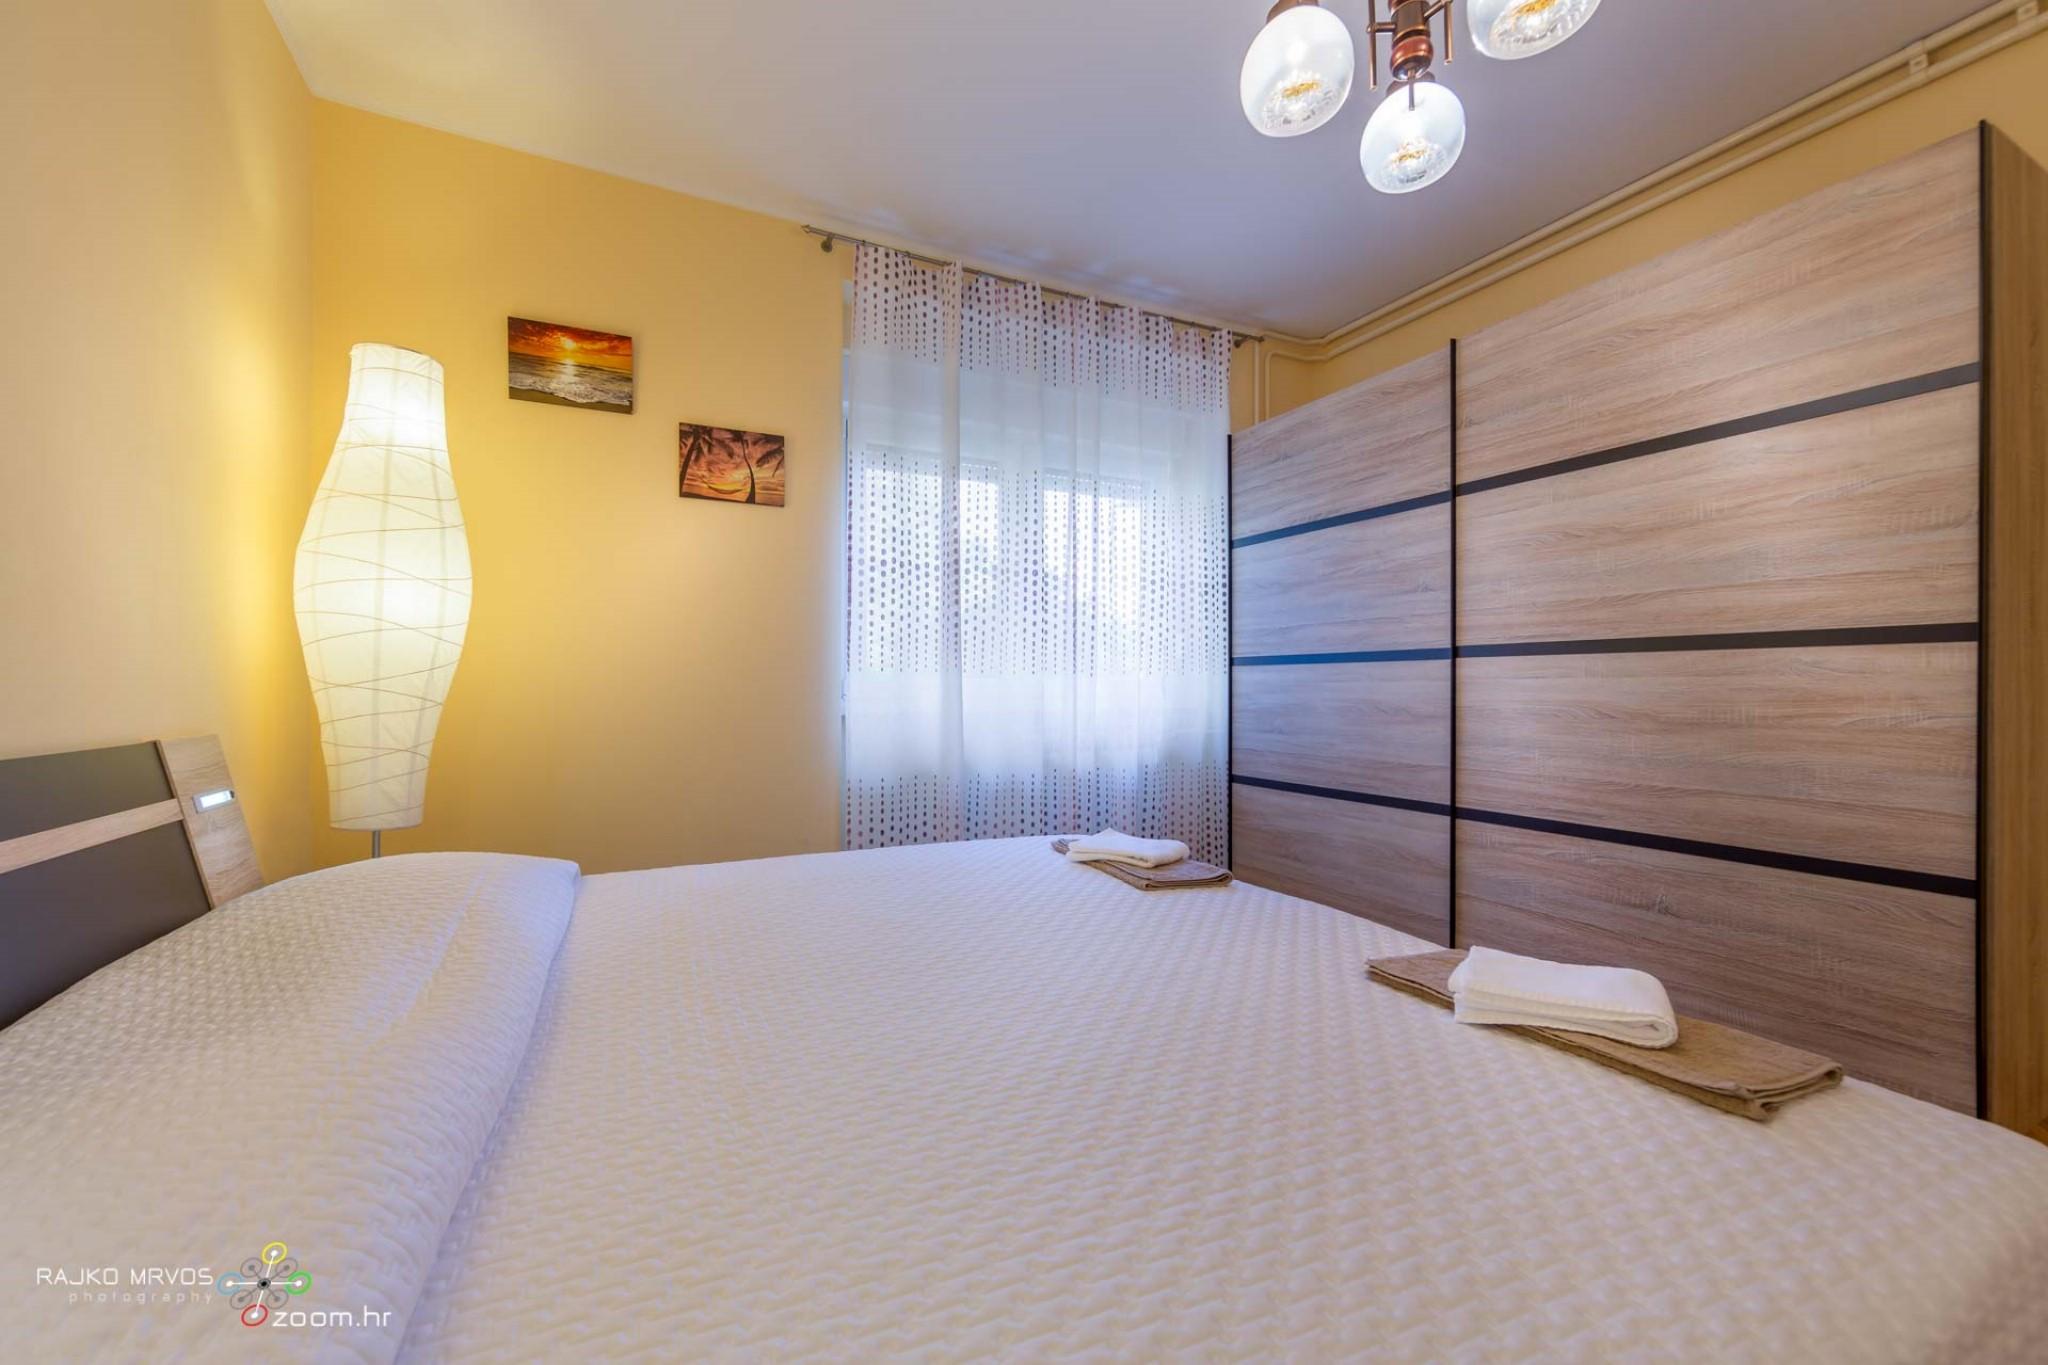 fotografiranje-interijera-fotograf-eksterijera-vila-apartmana-kuca-apartmani-Dujmic-24